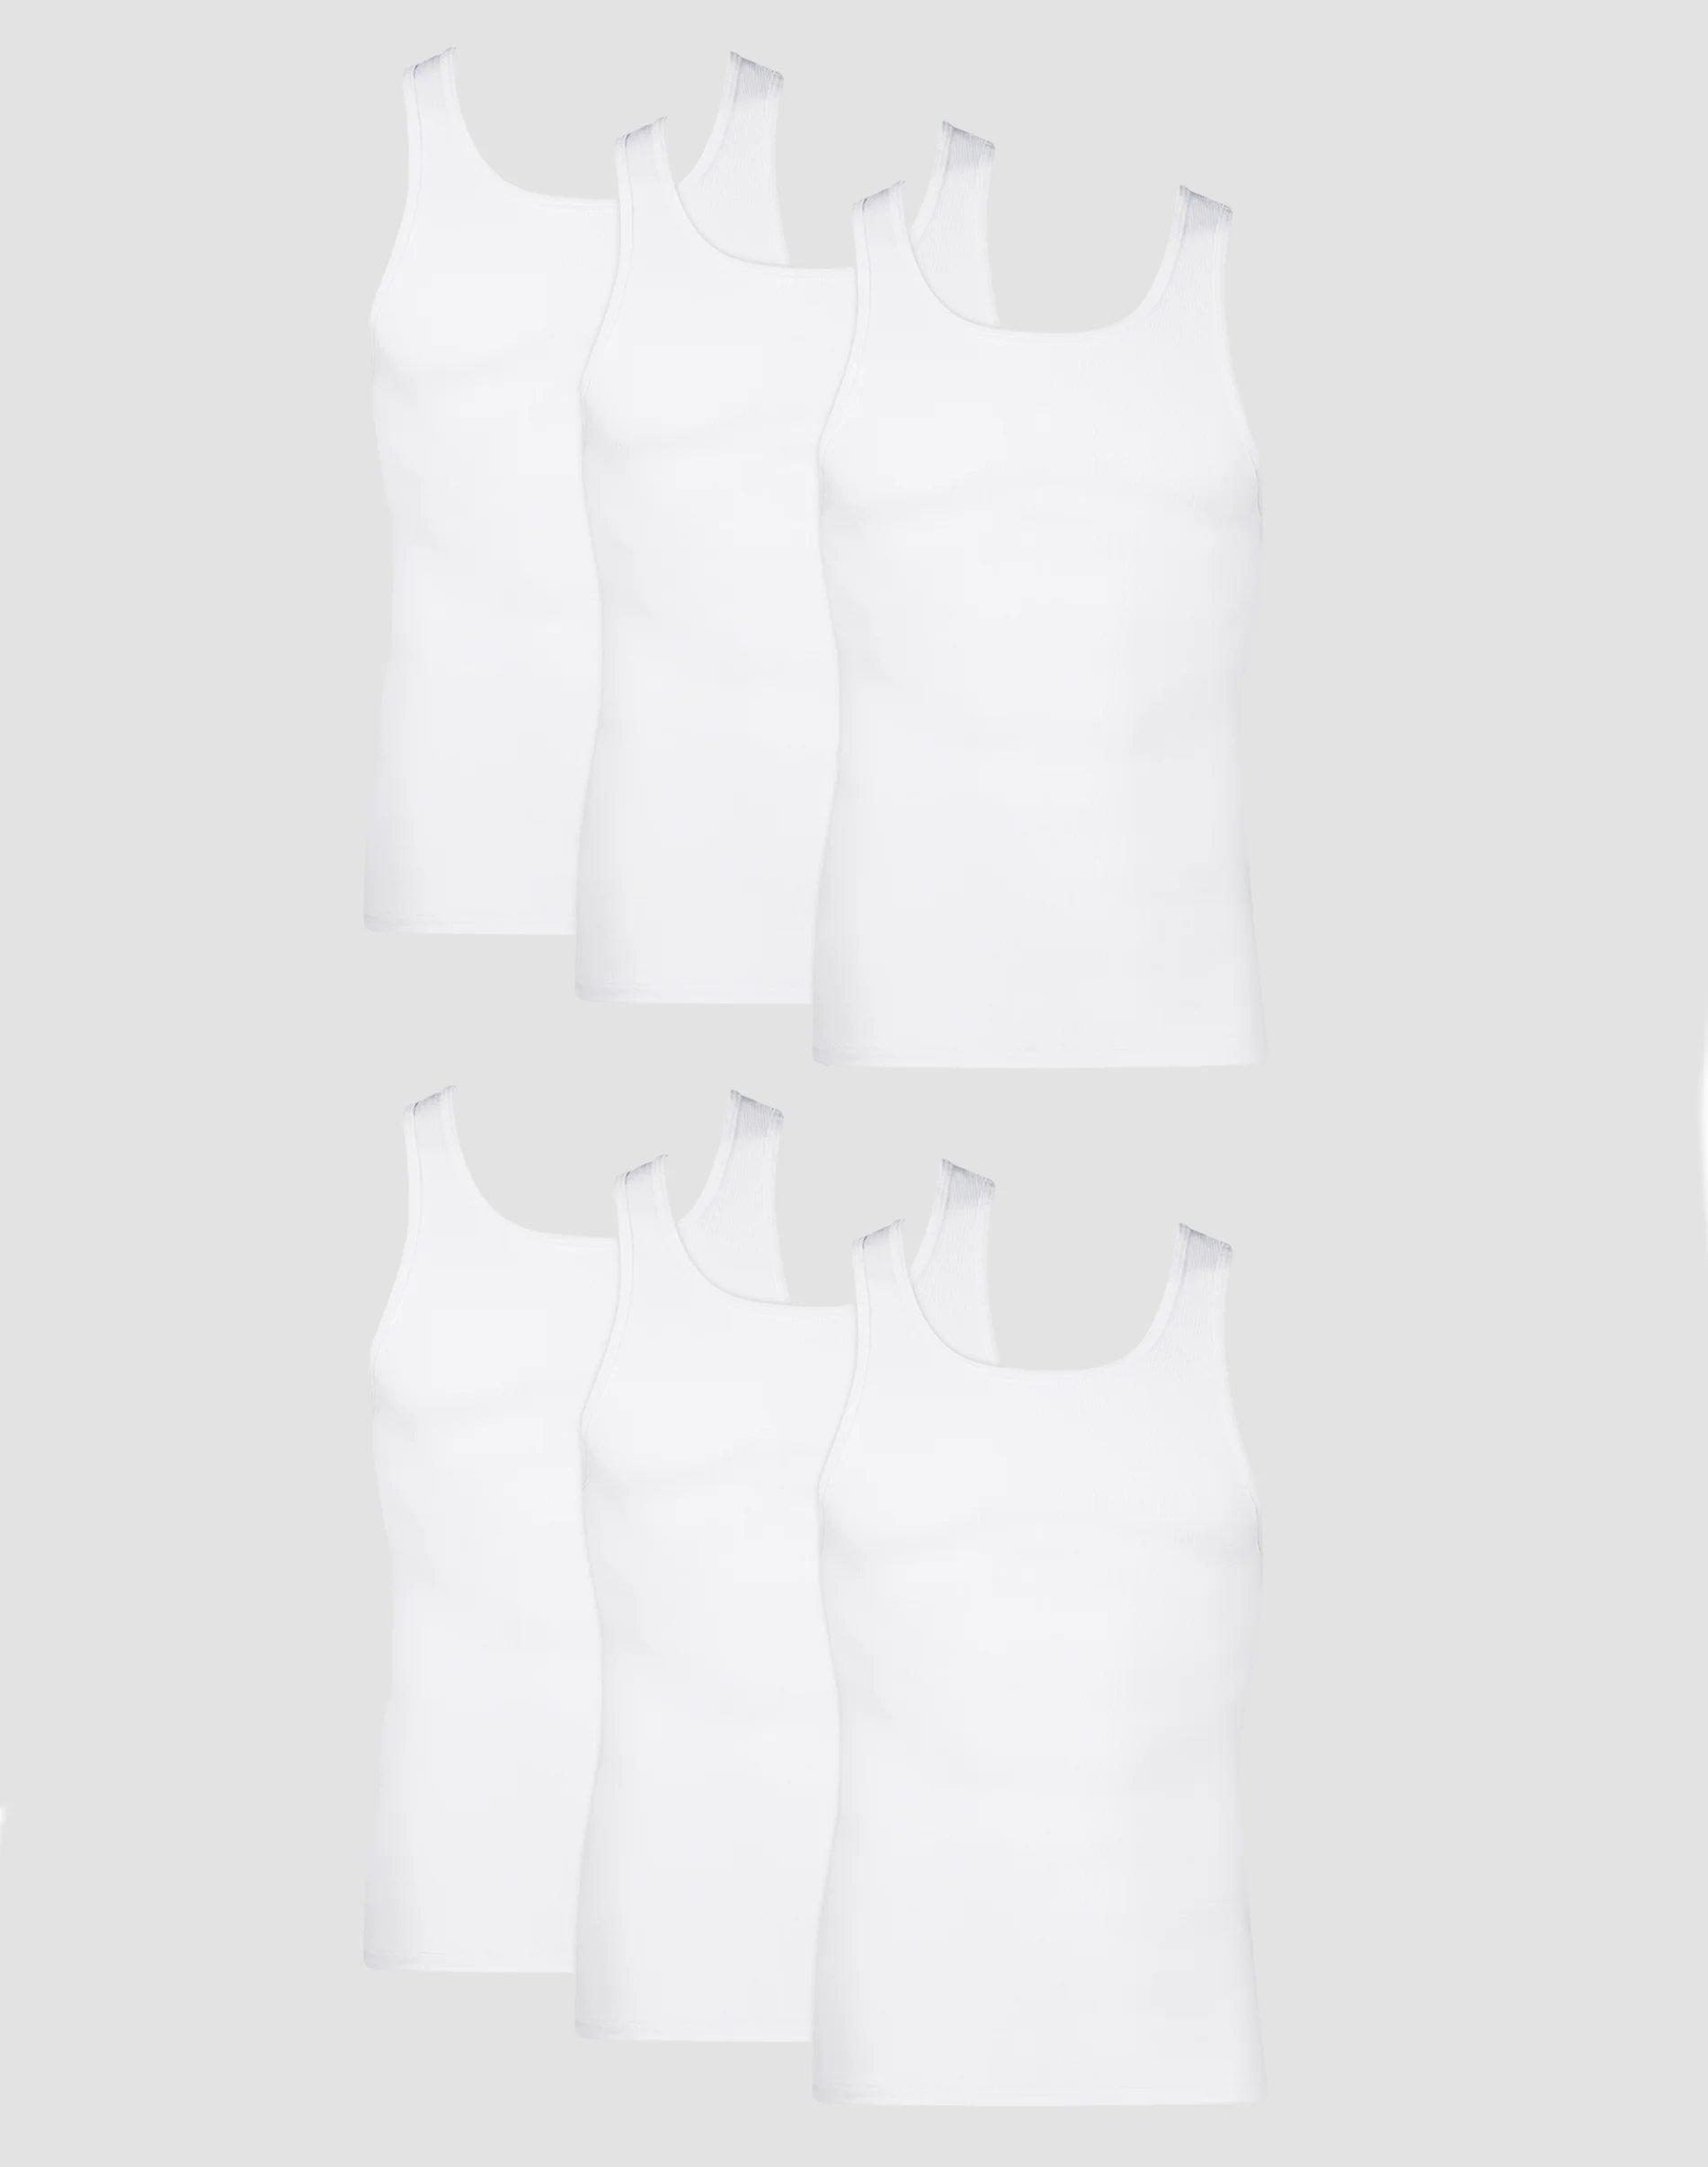 Hanes Mens Underwear Size Chart : hanes, underwear, chart, Hanes, Men's, TAGLESS, ComfortSoft, White, A-Shirt, <seo:, StoreName/>